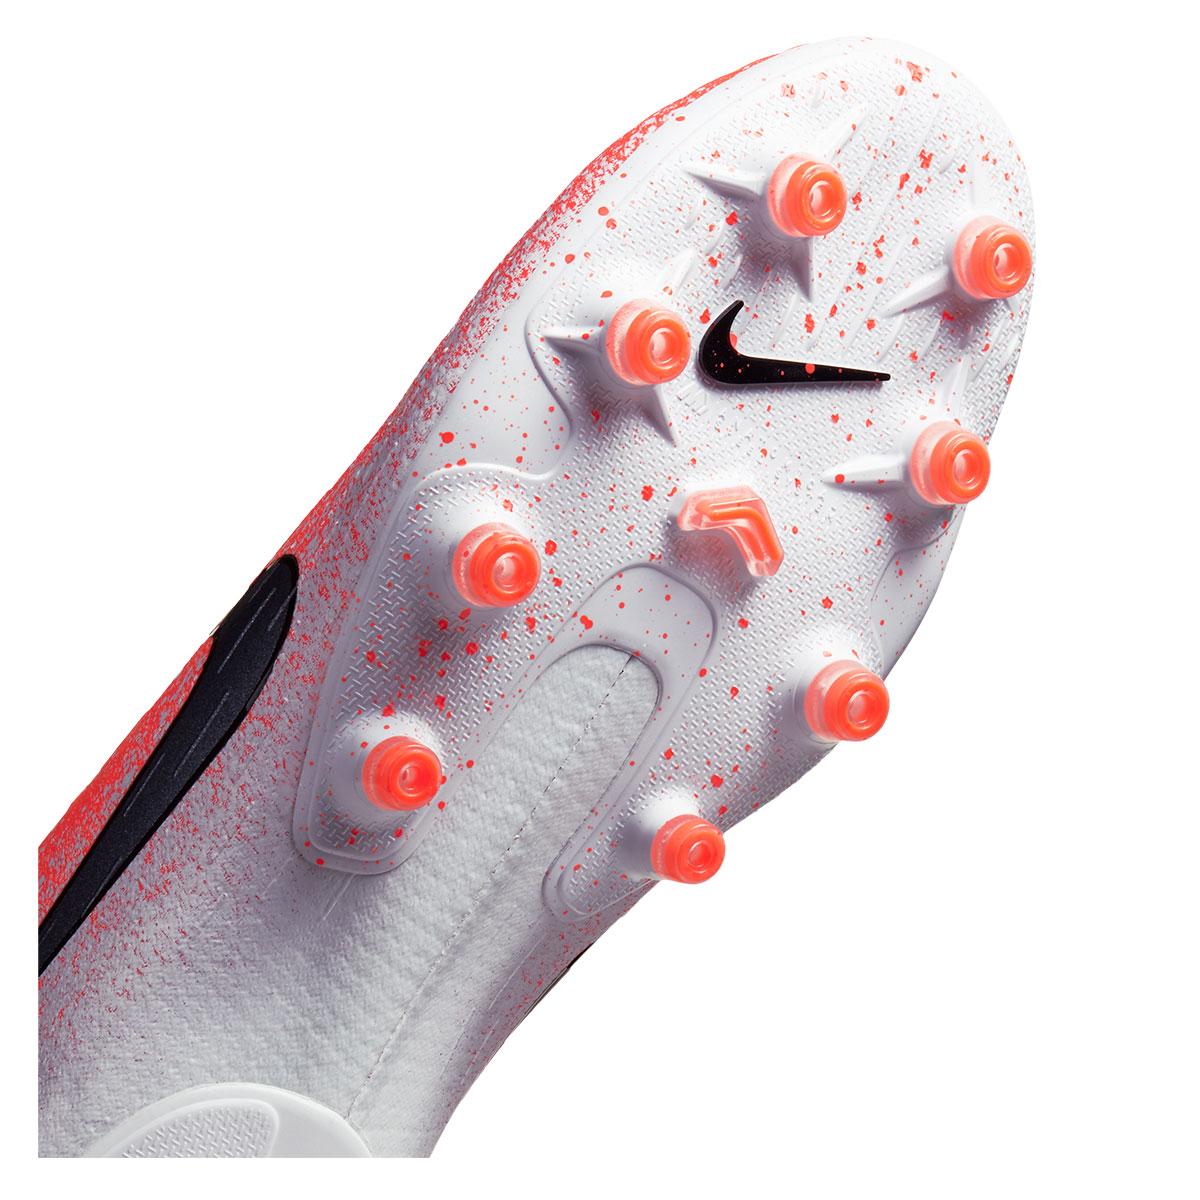 25e1db9fe12 Nike mercurial superfly VI pro AG pro kunstgras voetbalschoenen oranje/wit  Afbeelding 6